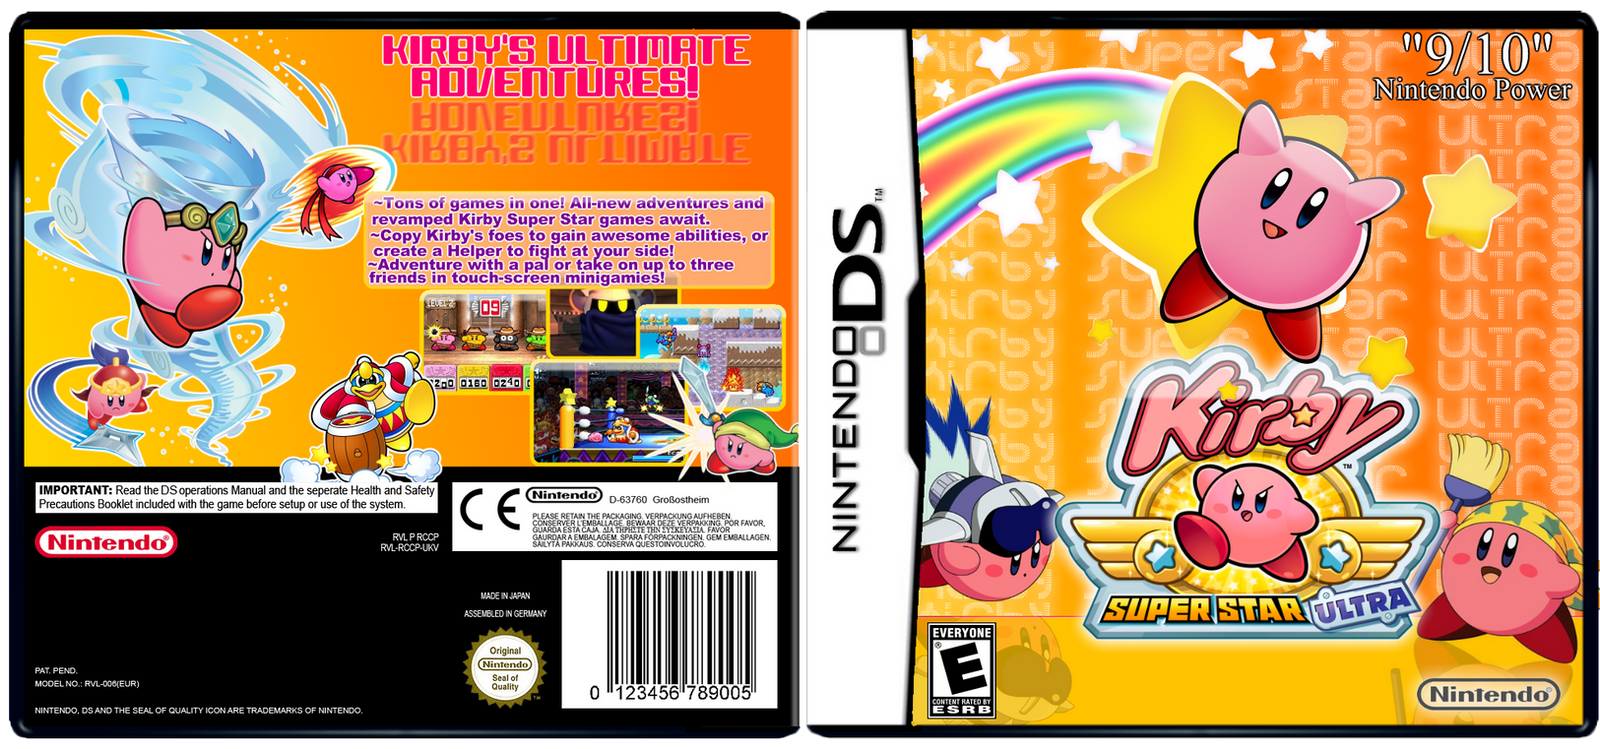 Kirby Super Star Ultra Details - LaunchBox Games Database |Kirby Super Star Box